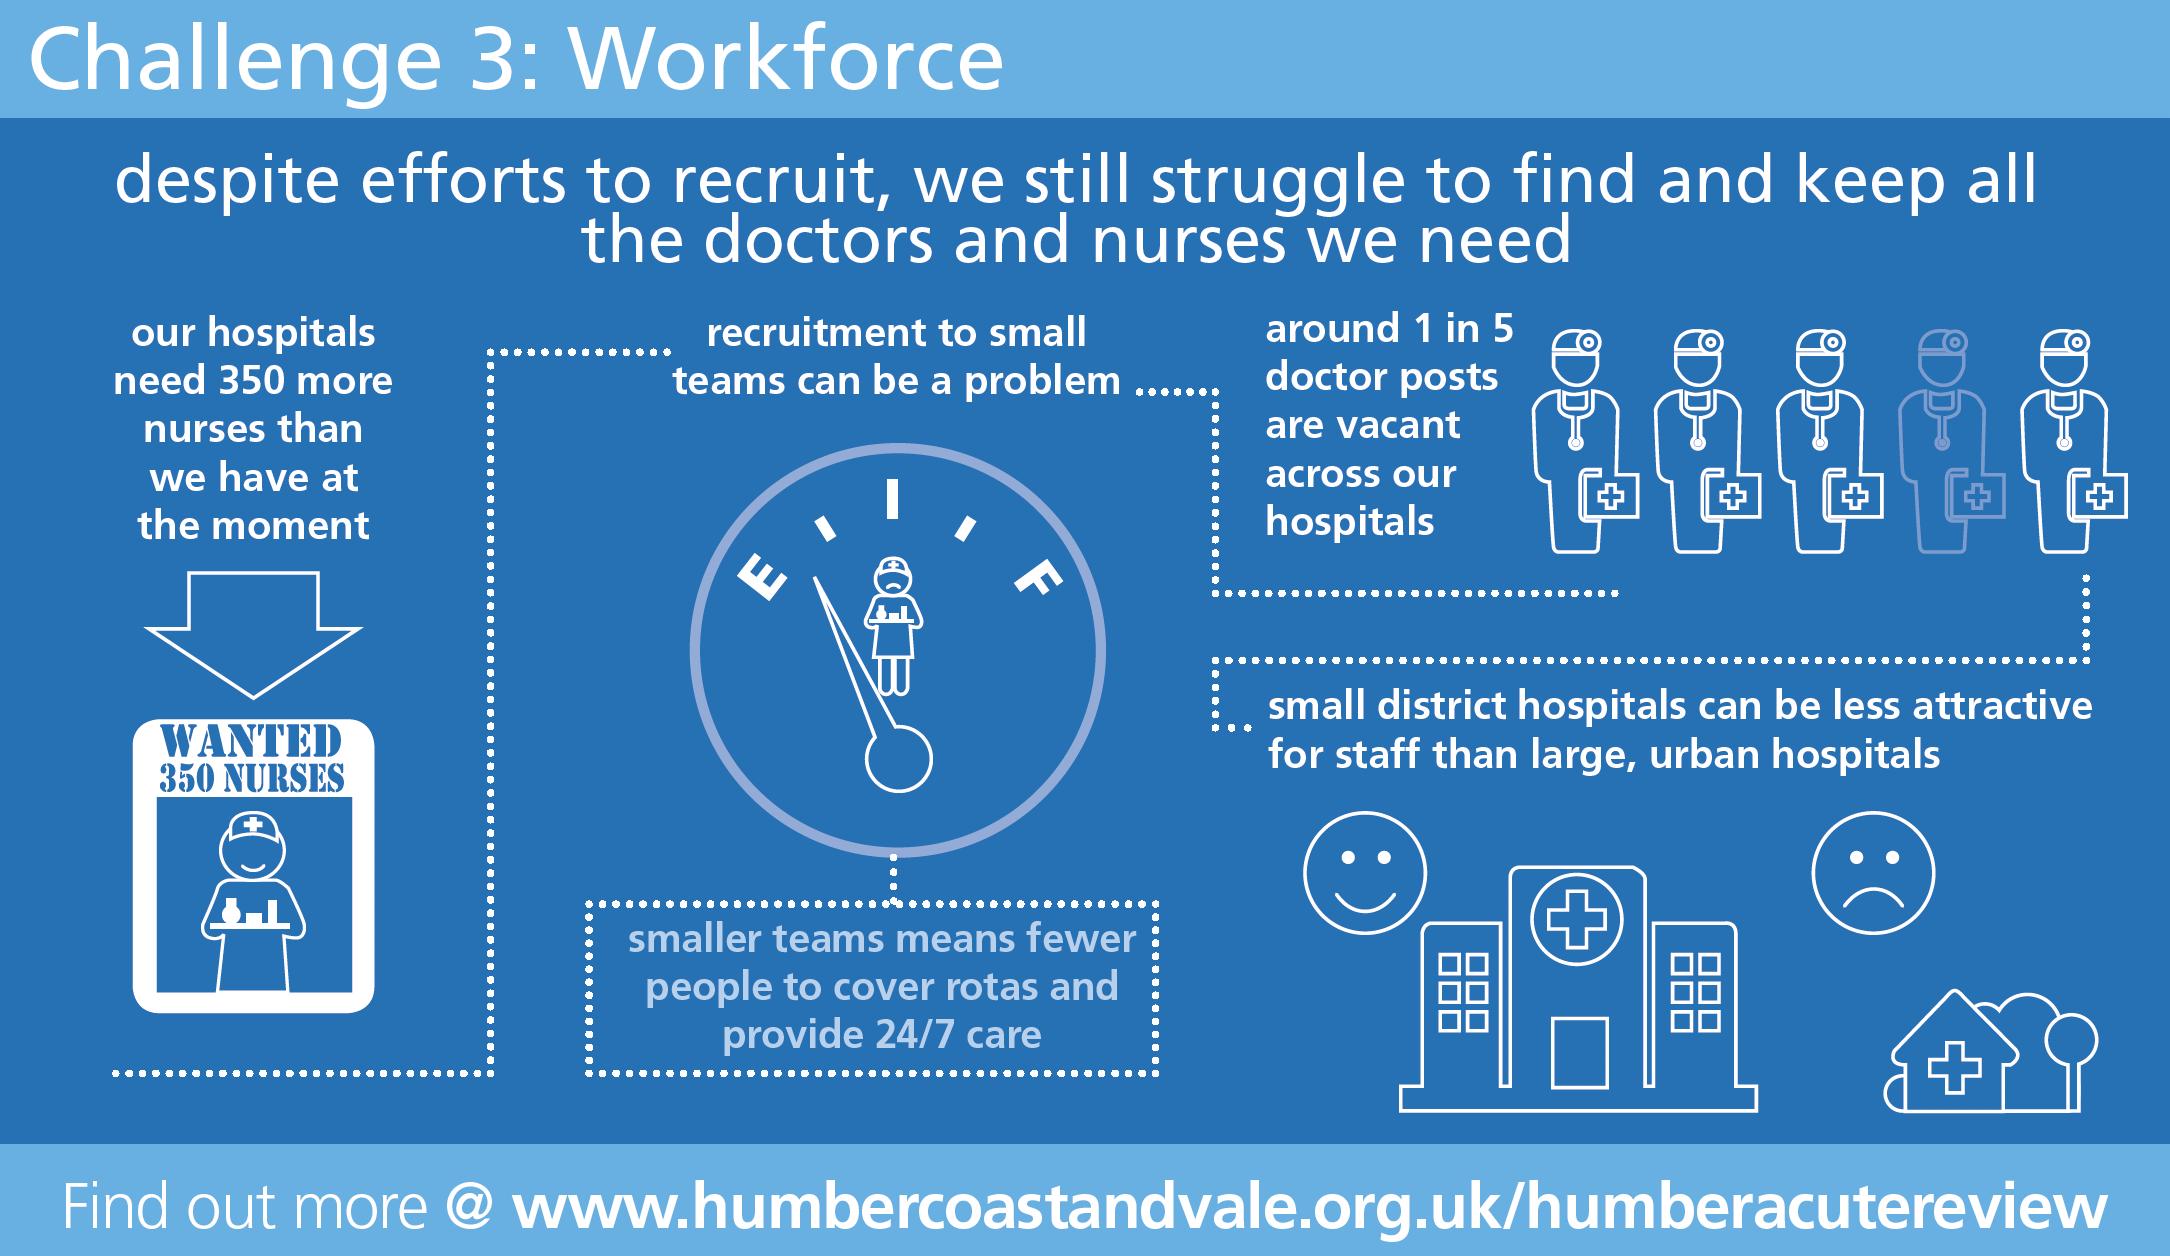 Workforce Challenge infographic